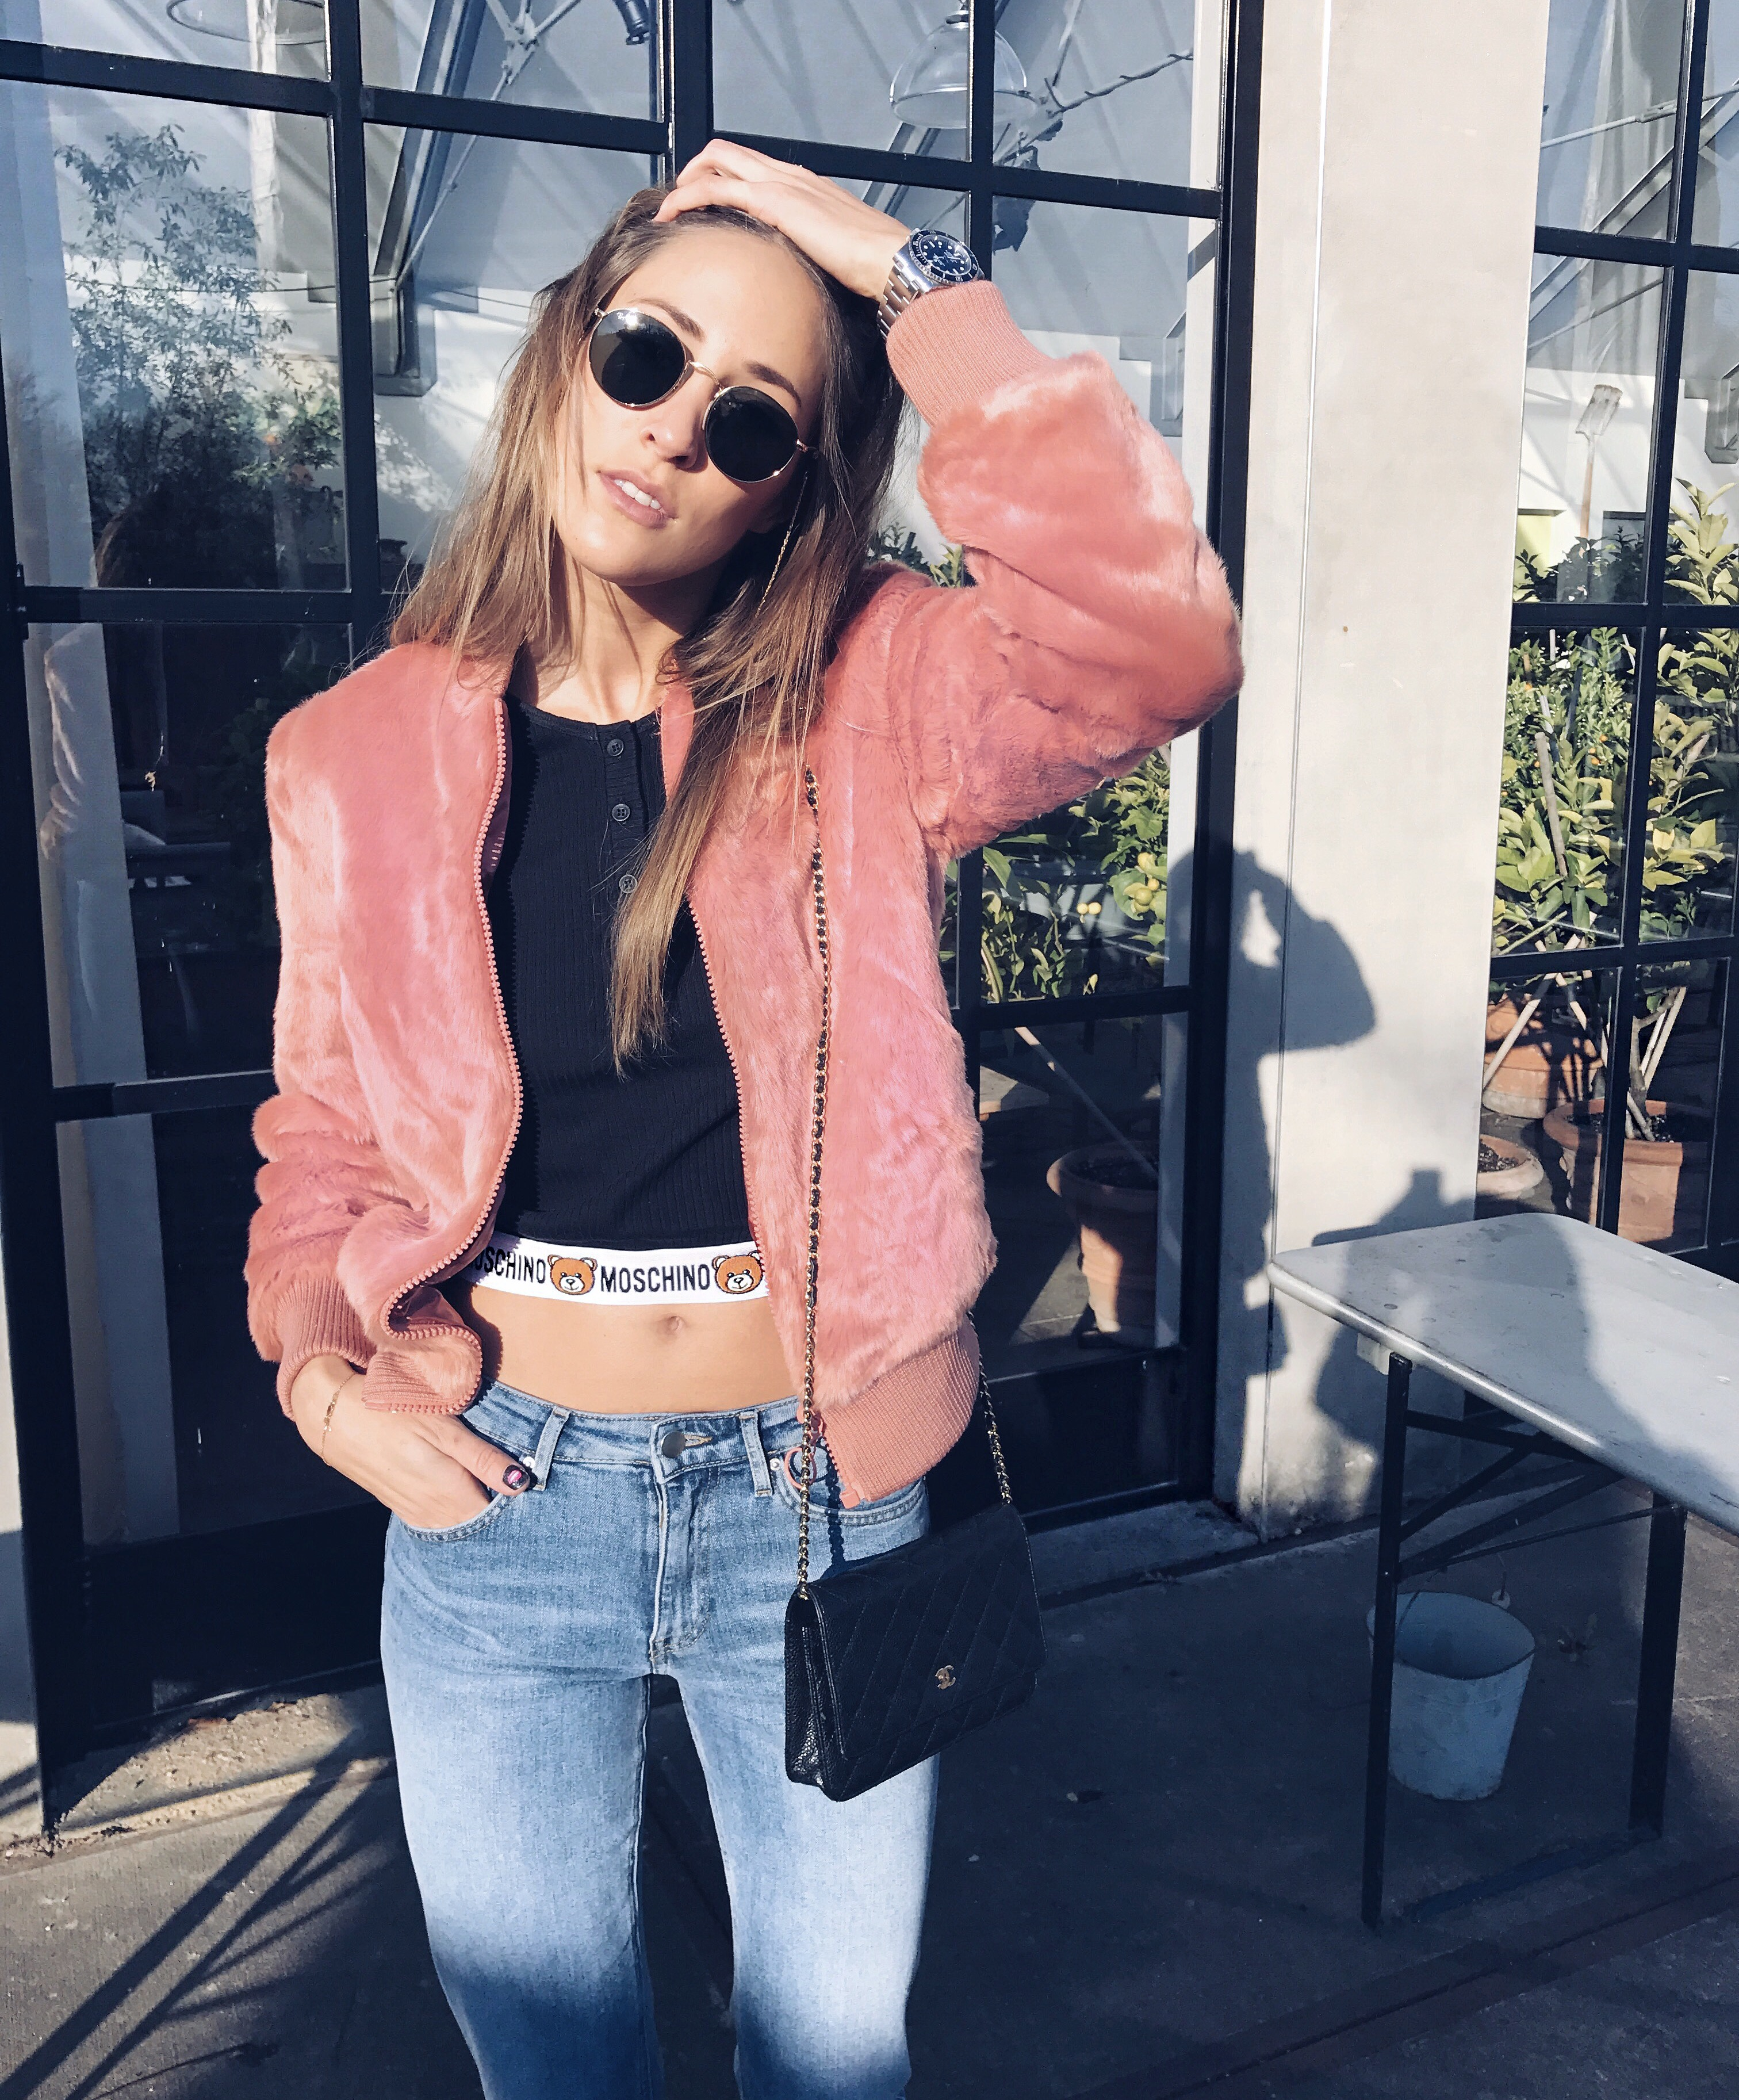 linda_tsetis_worlds_affair_moschino_pink_bomber_AsSeenOnMe